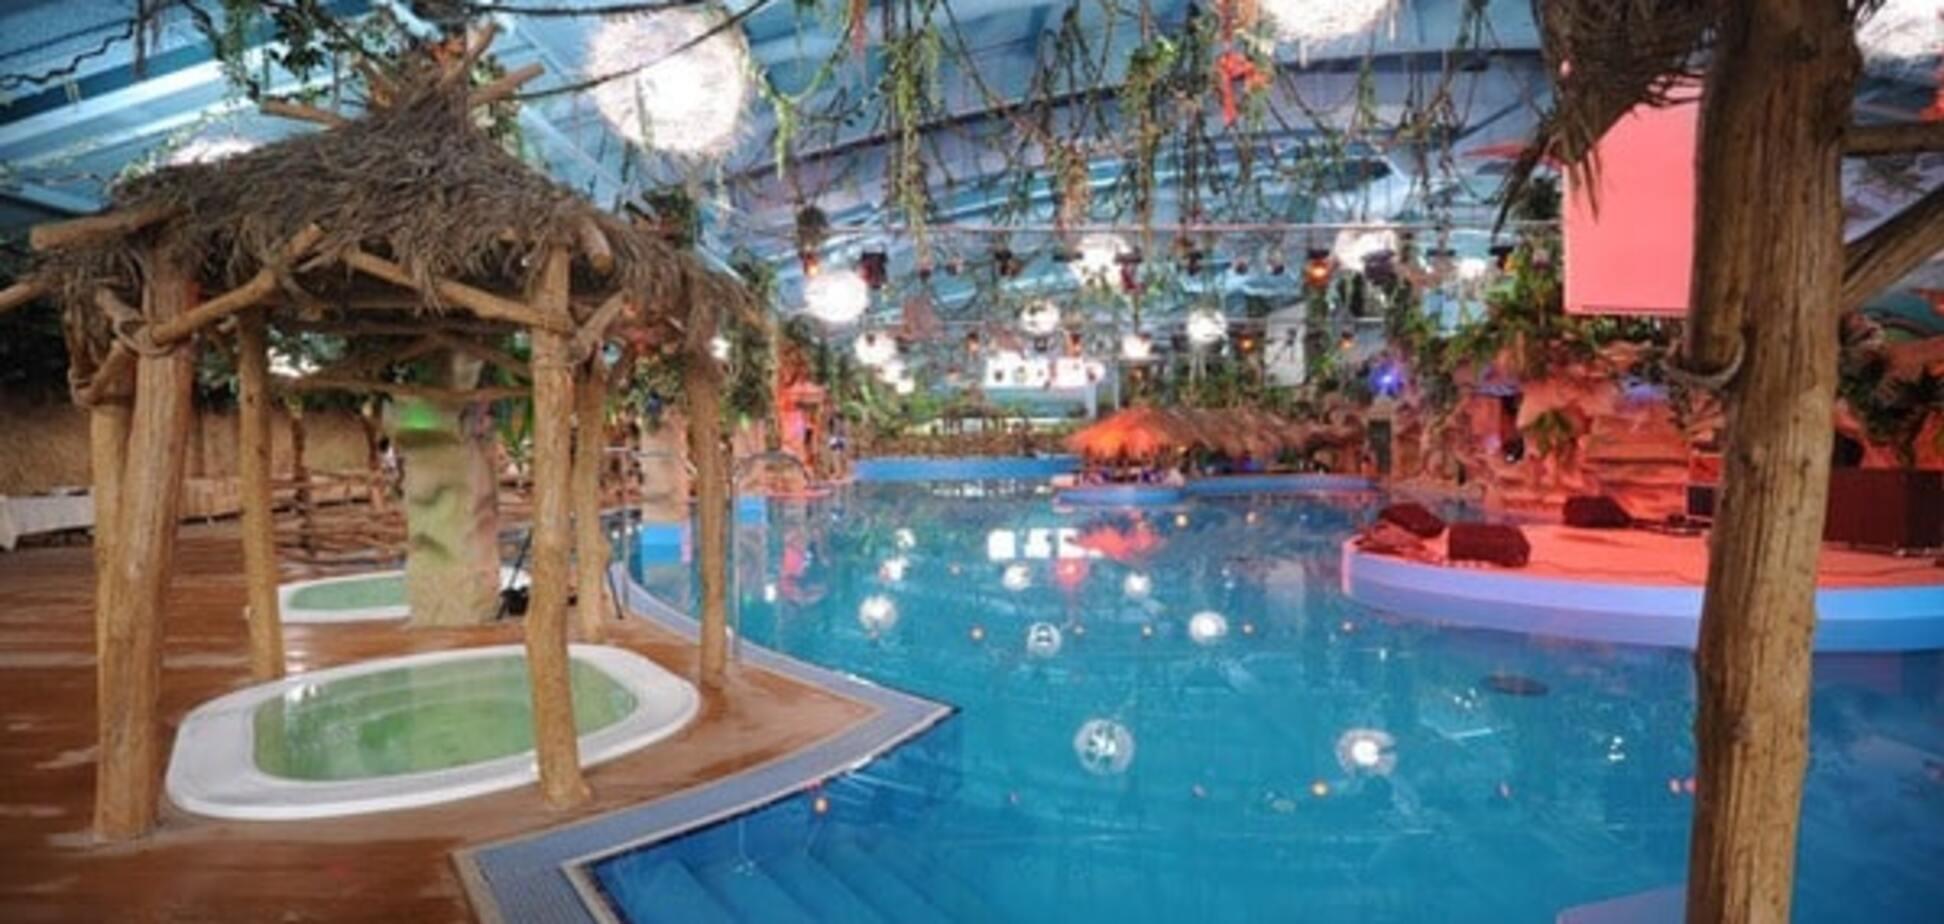 В аквапарку київського ТРЦ потонула дитина